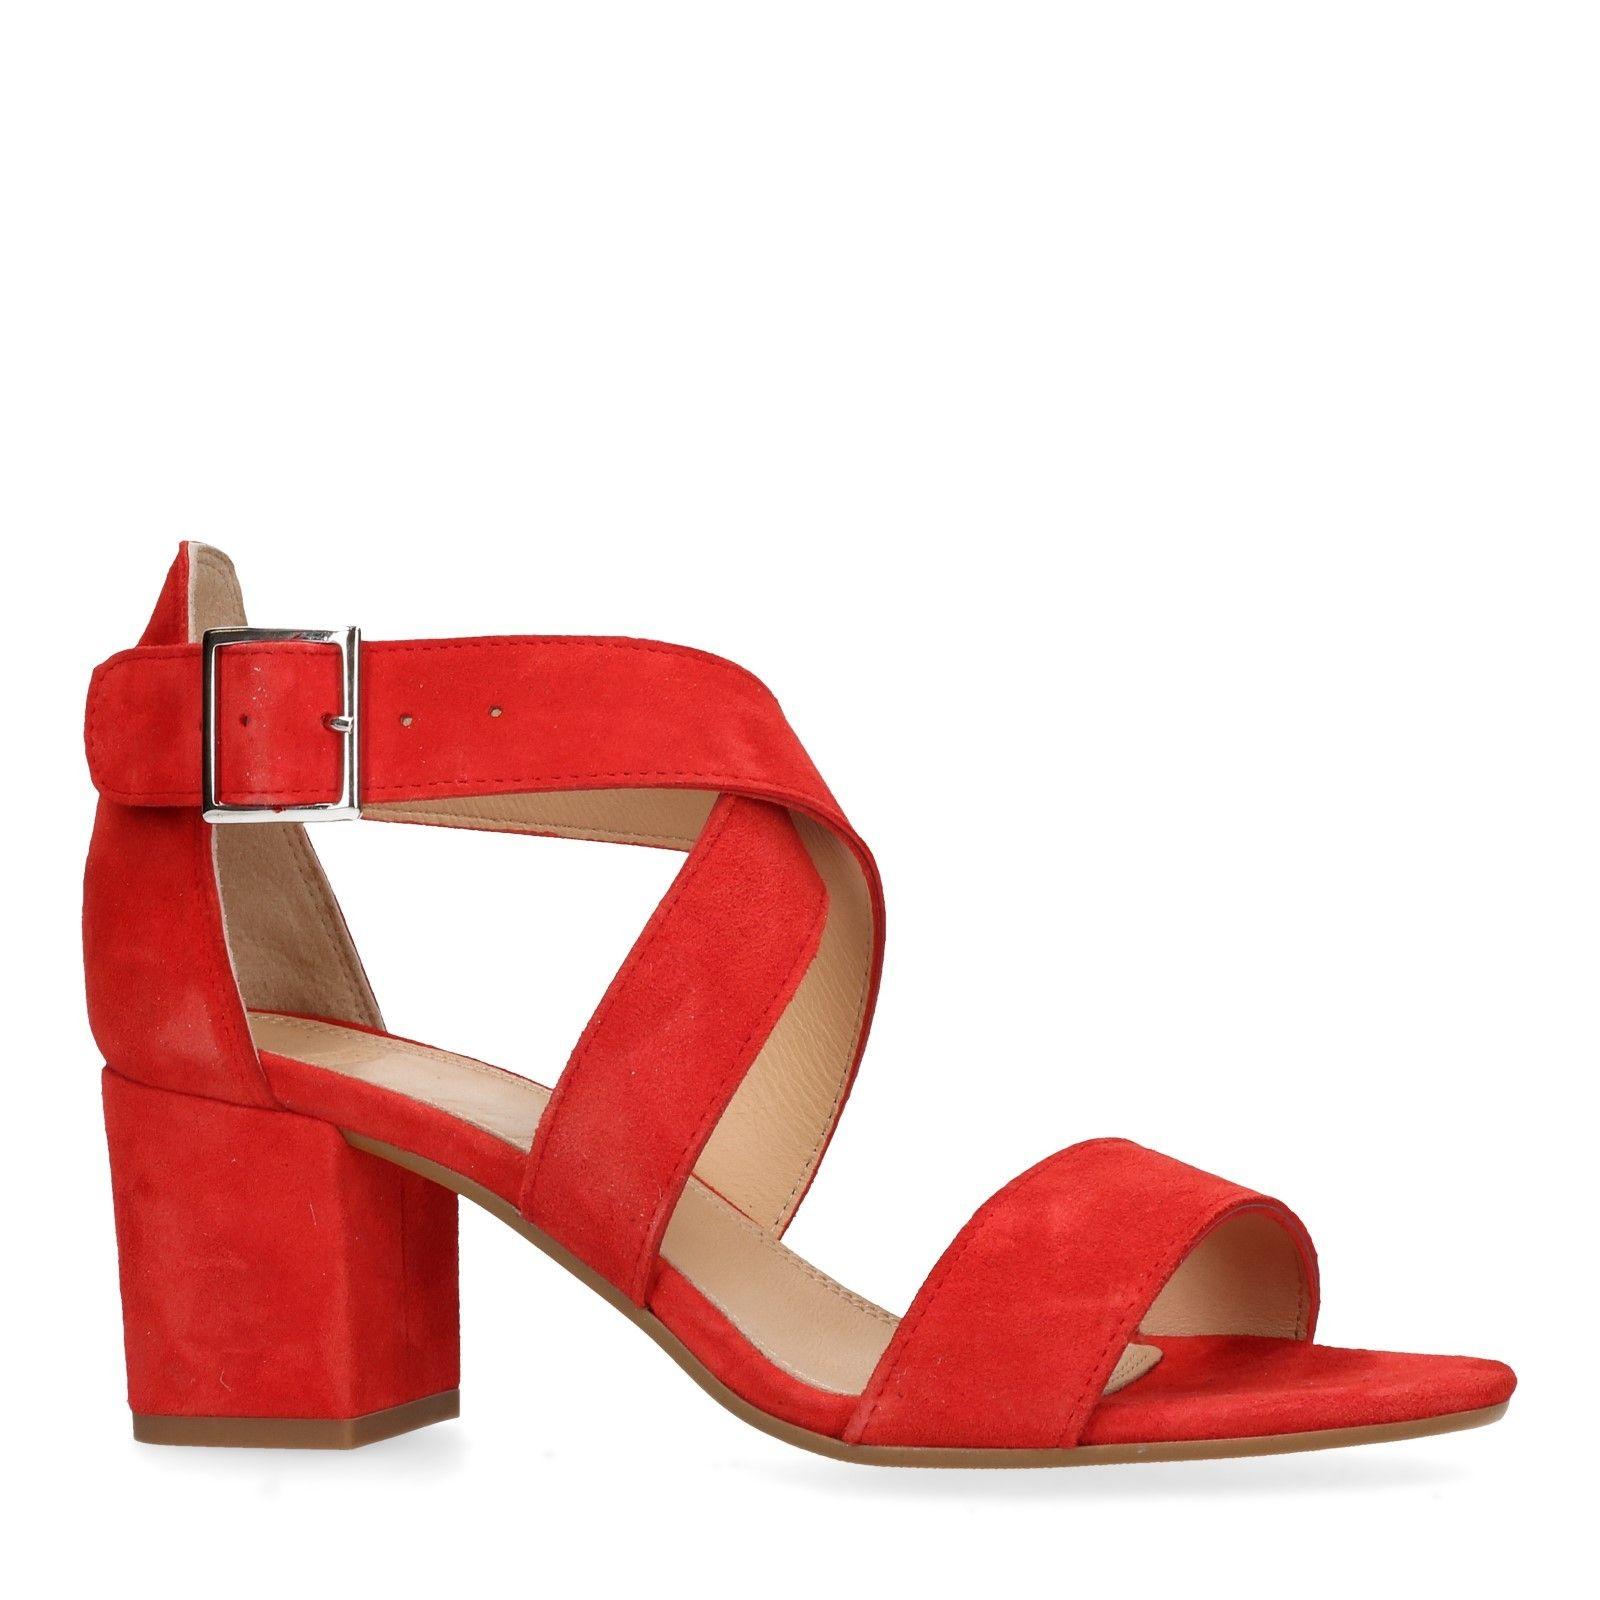 Rode sandalen met hak Dames | MANFIELD | Sandaal met hak